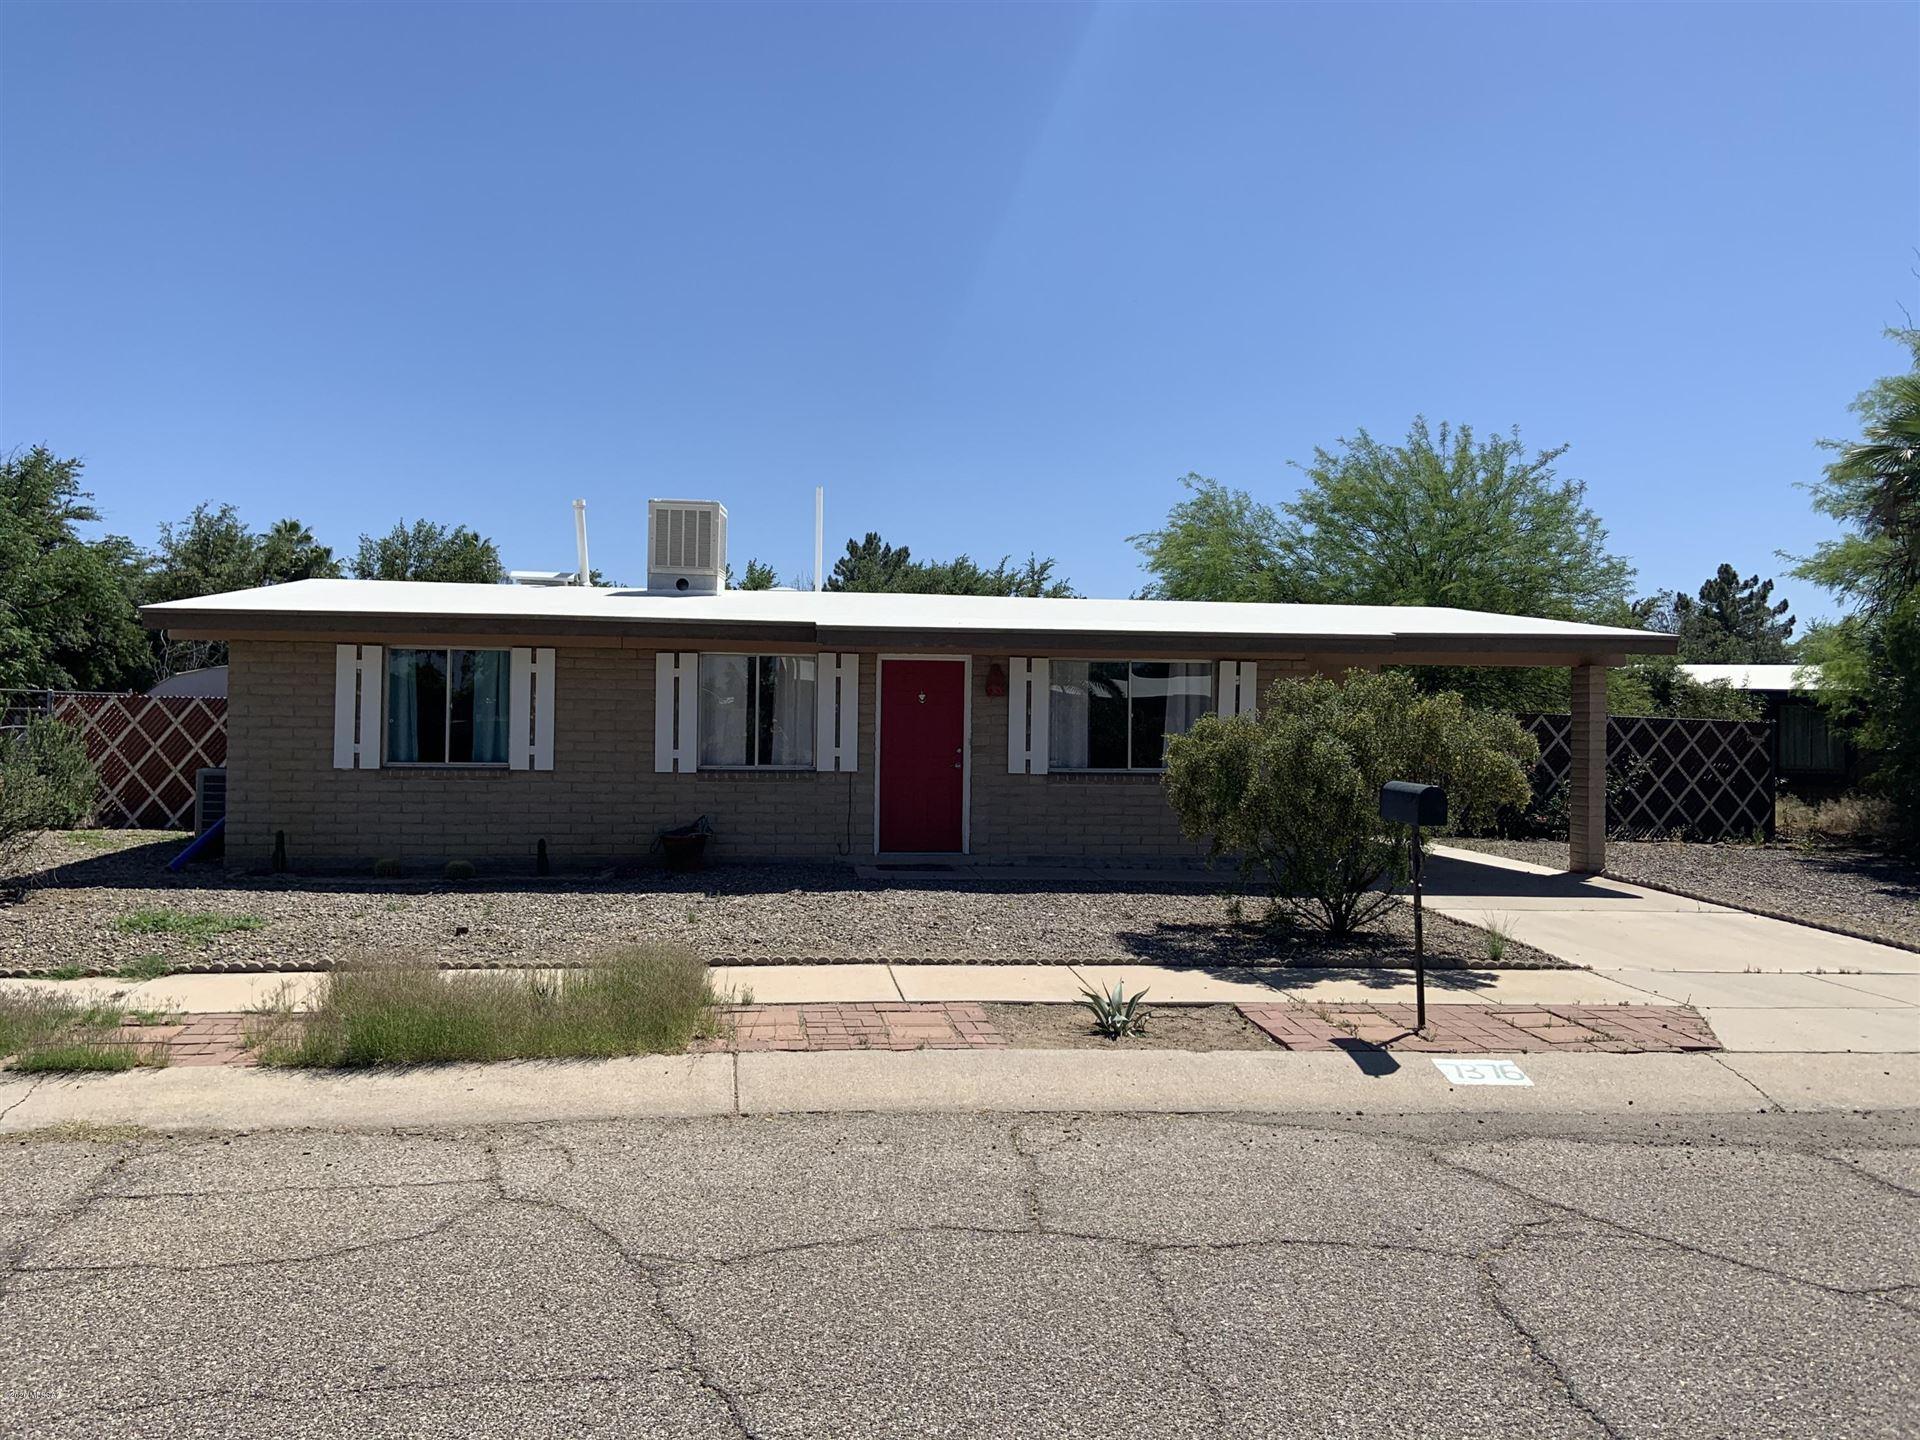 7376 N Patriot Drive, Tucson, AZ 85741 - #: 22010906